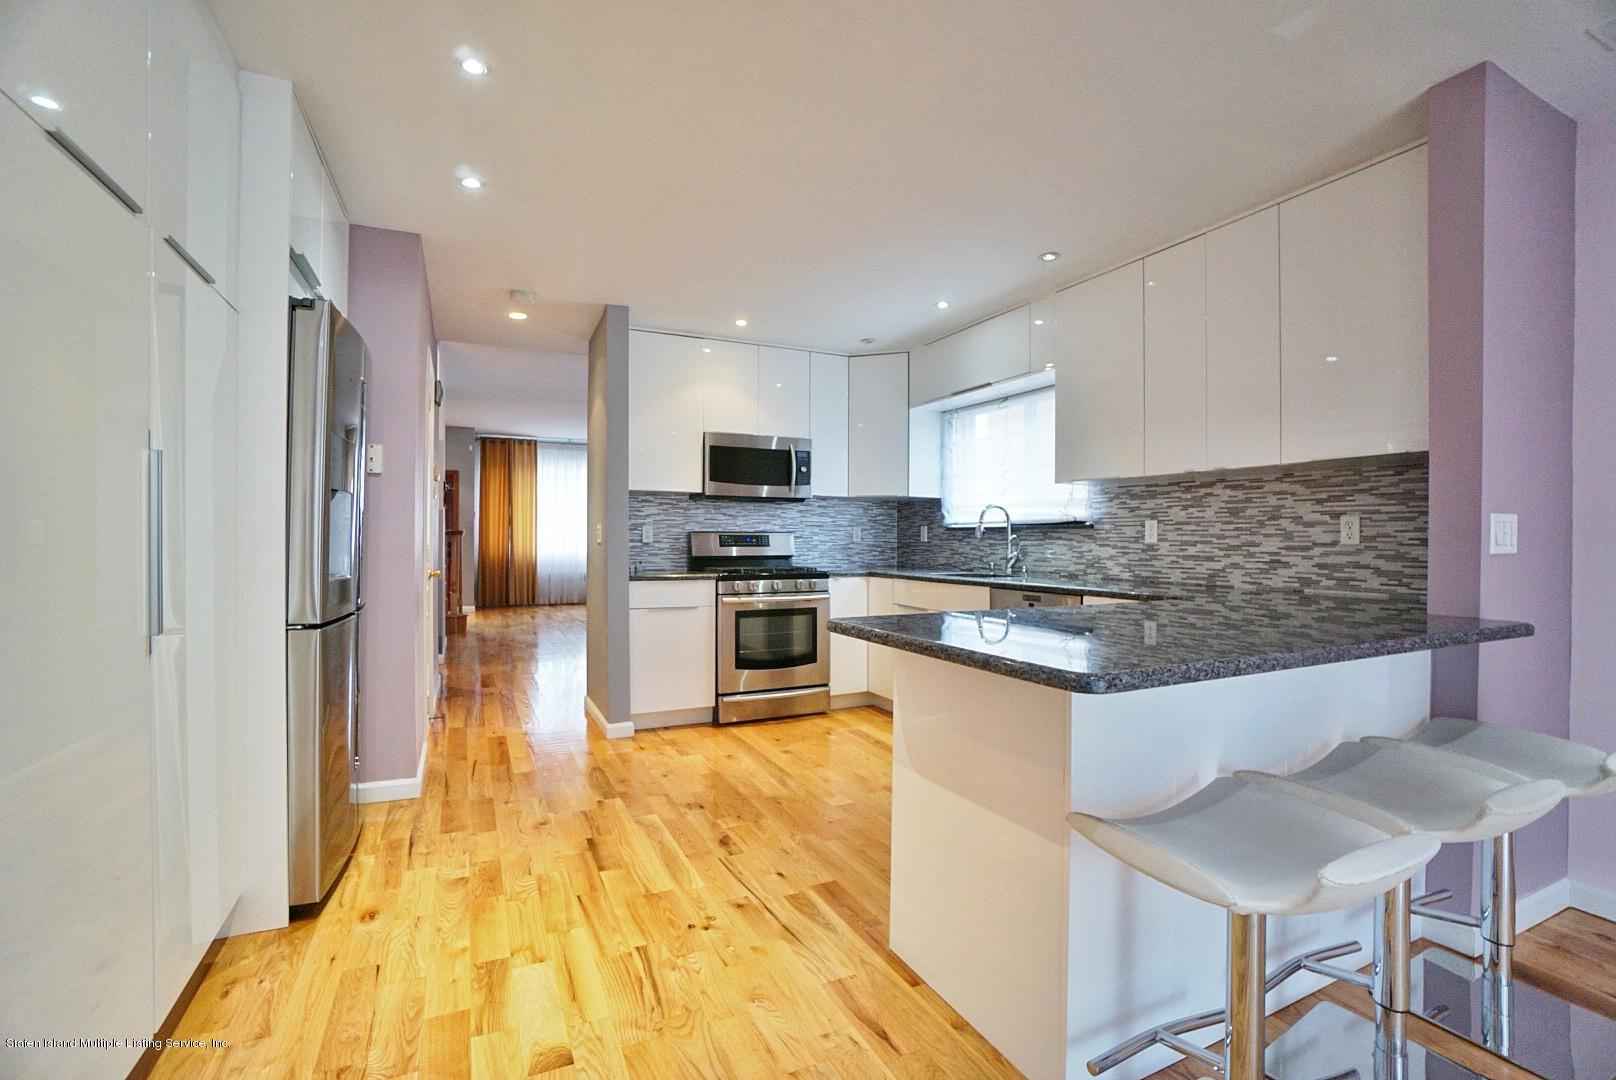 Single Family - Detached 311 Norway Avenue  Staten Island, NY 10305, MLS-1132870-9